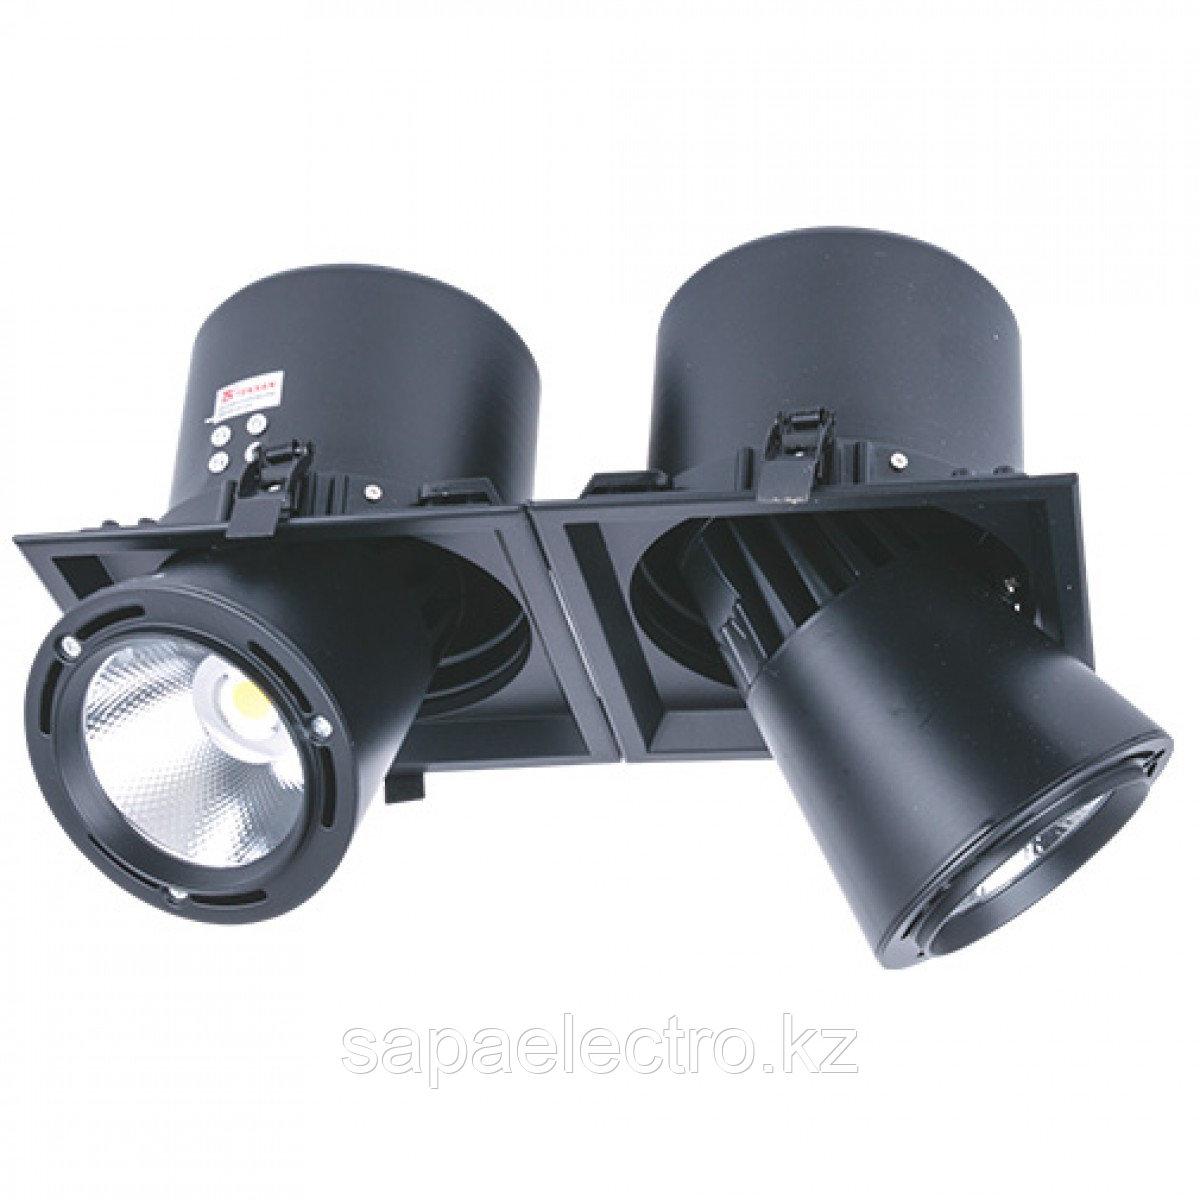 Свет-к DL LED LS-DK913-2 2x 40W BLACK 5700K(TS)4шт